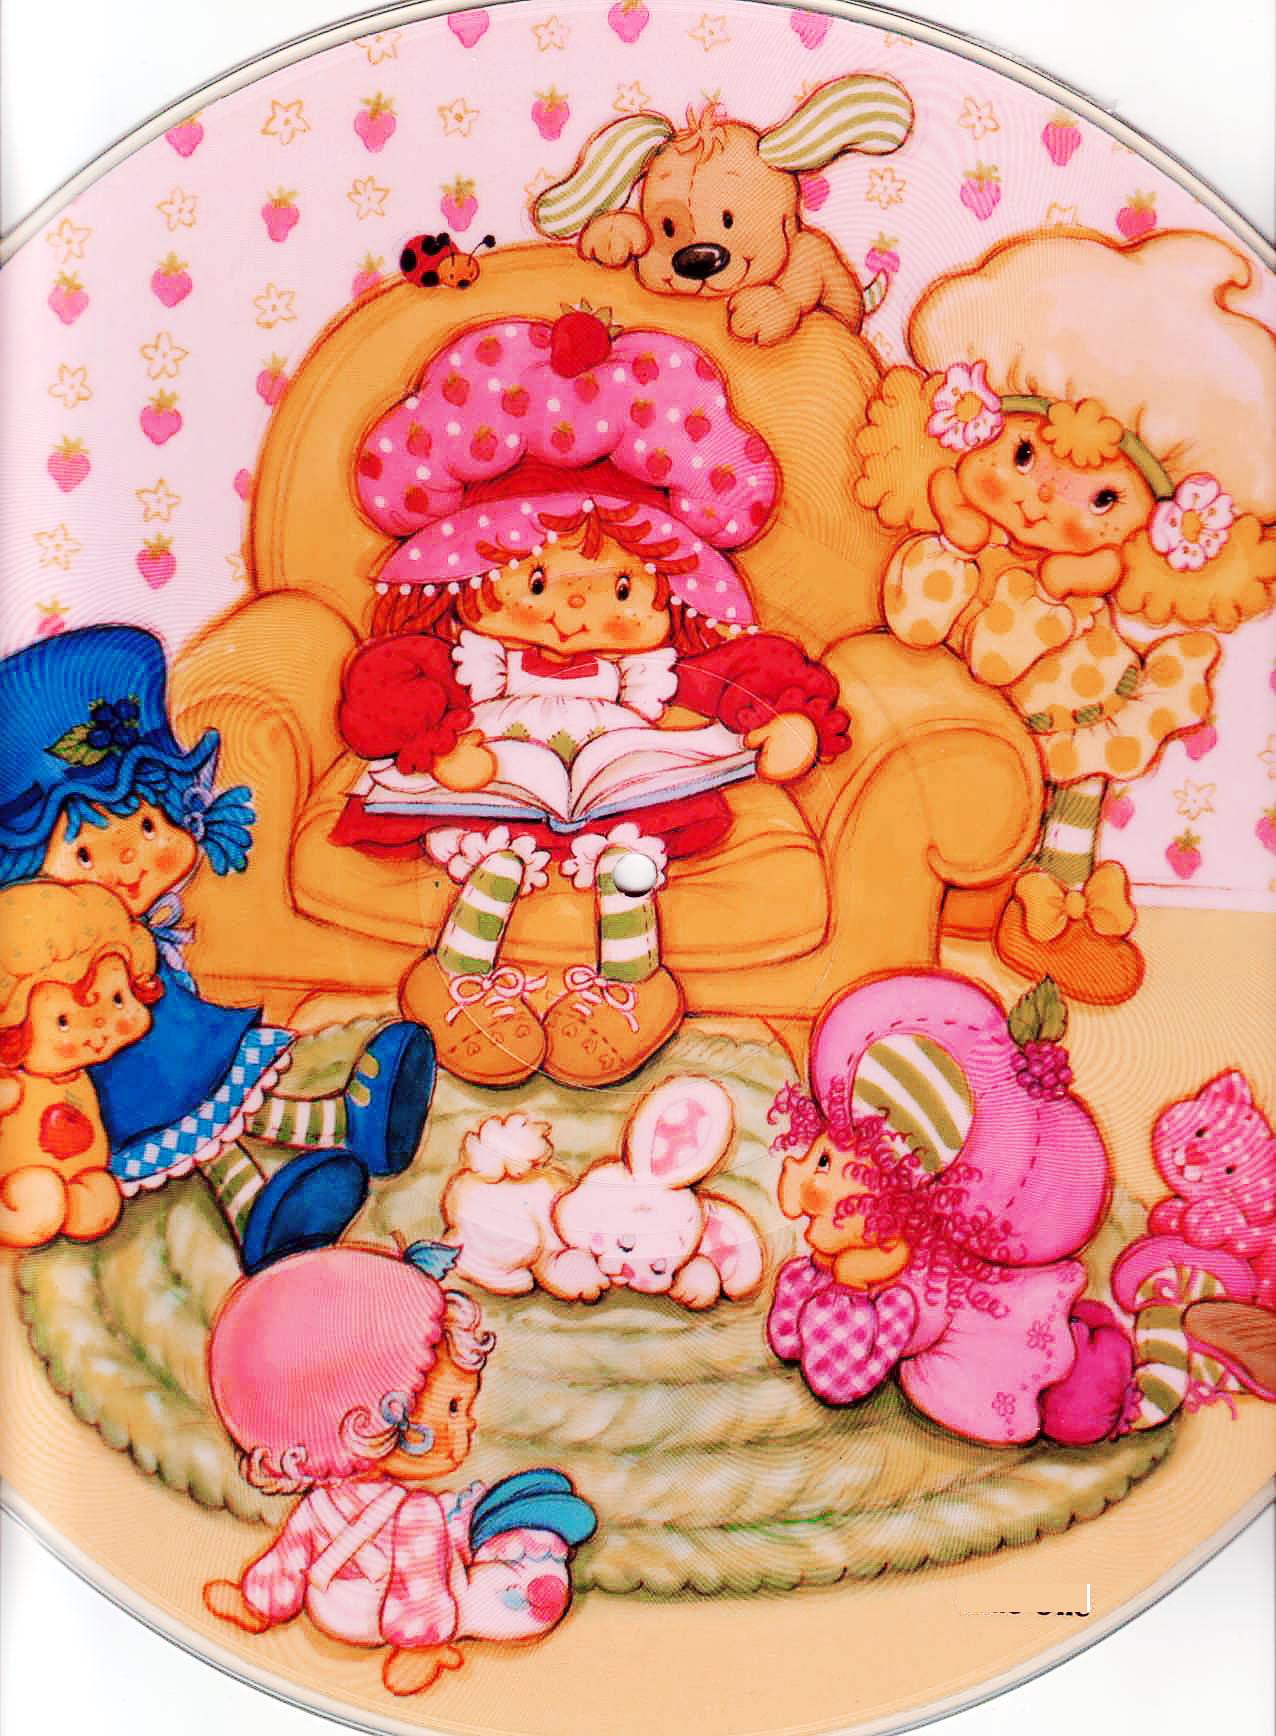 Clip Art - Clip art strawberry shortcake 207944